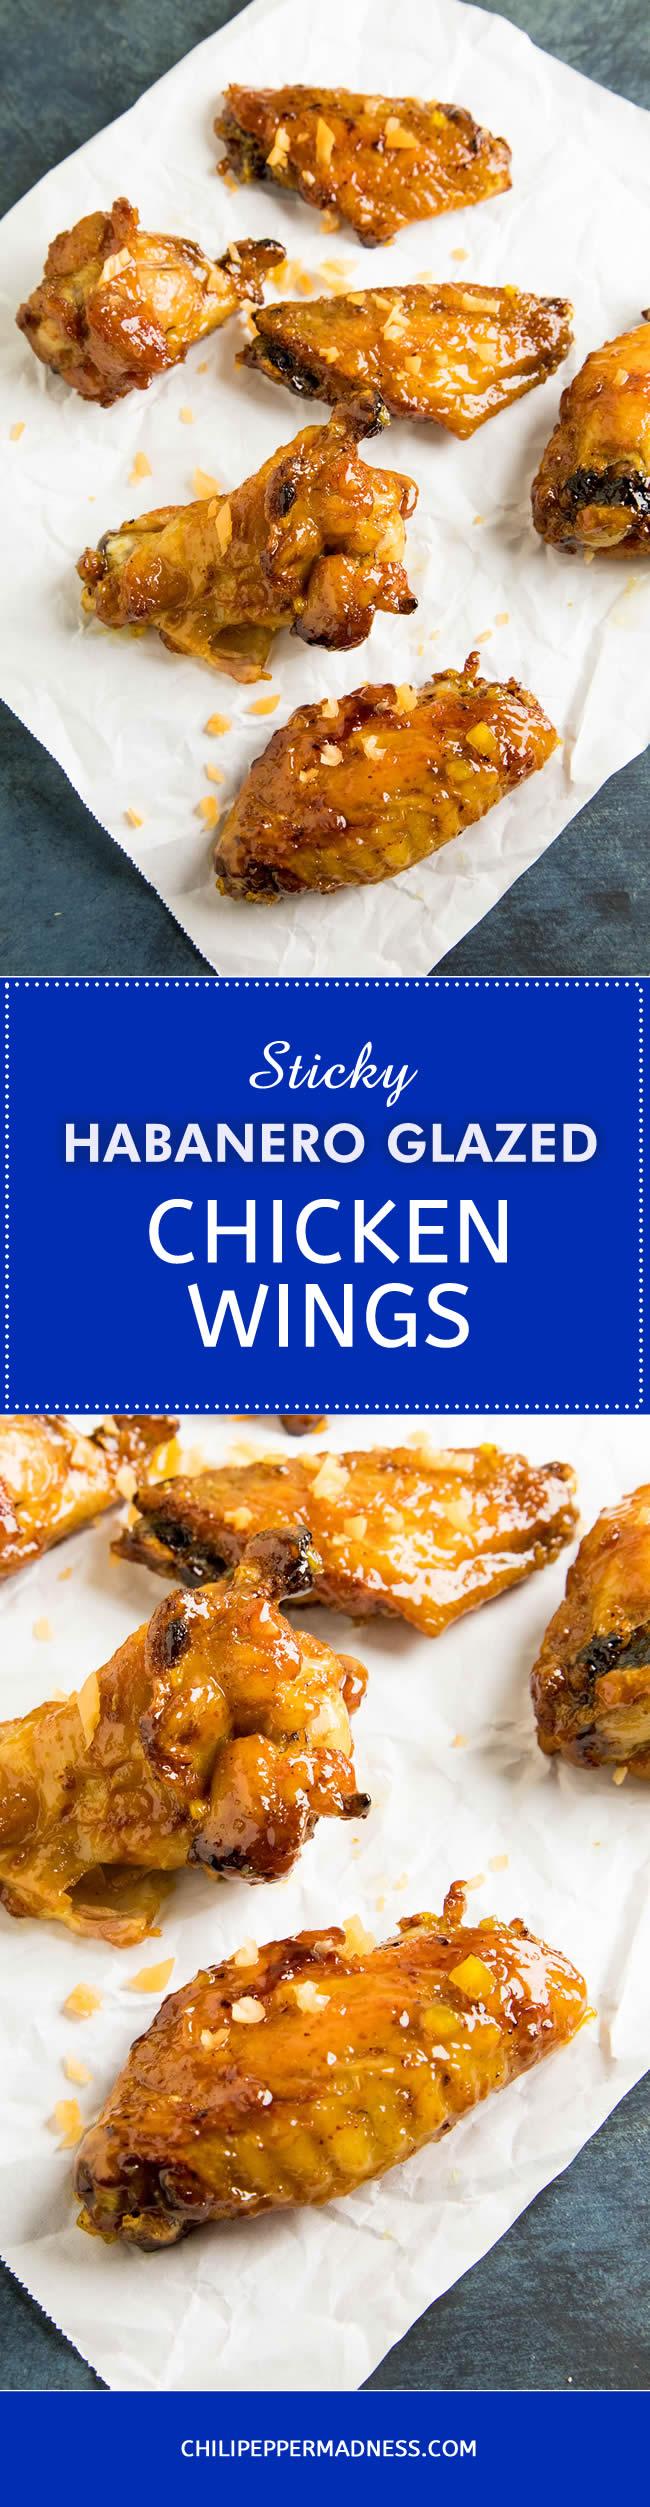 Sticky Habanero Glazed Chicken Wings - Recipe